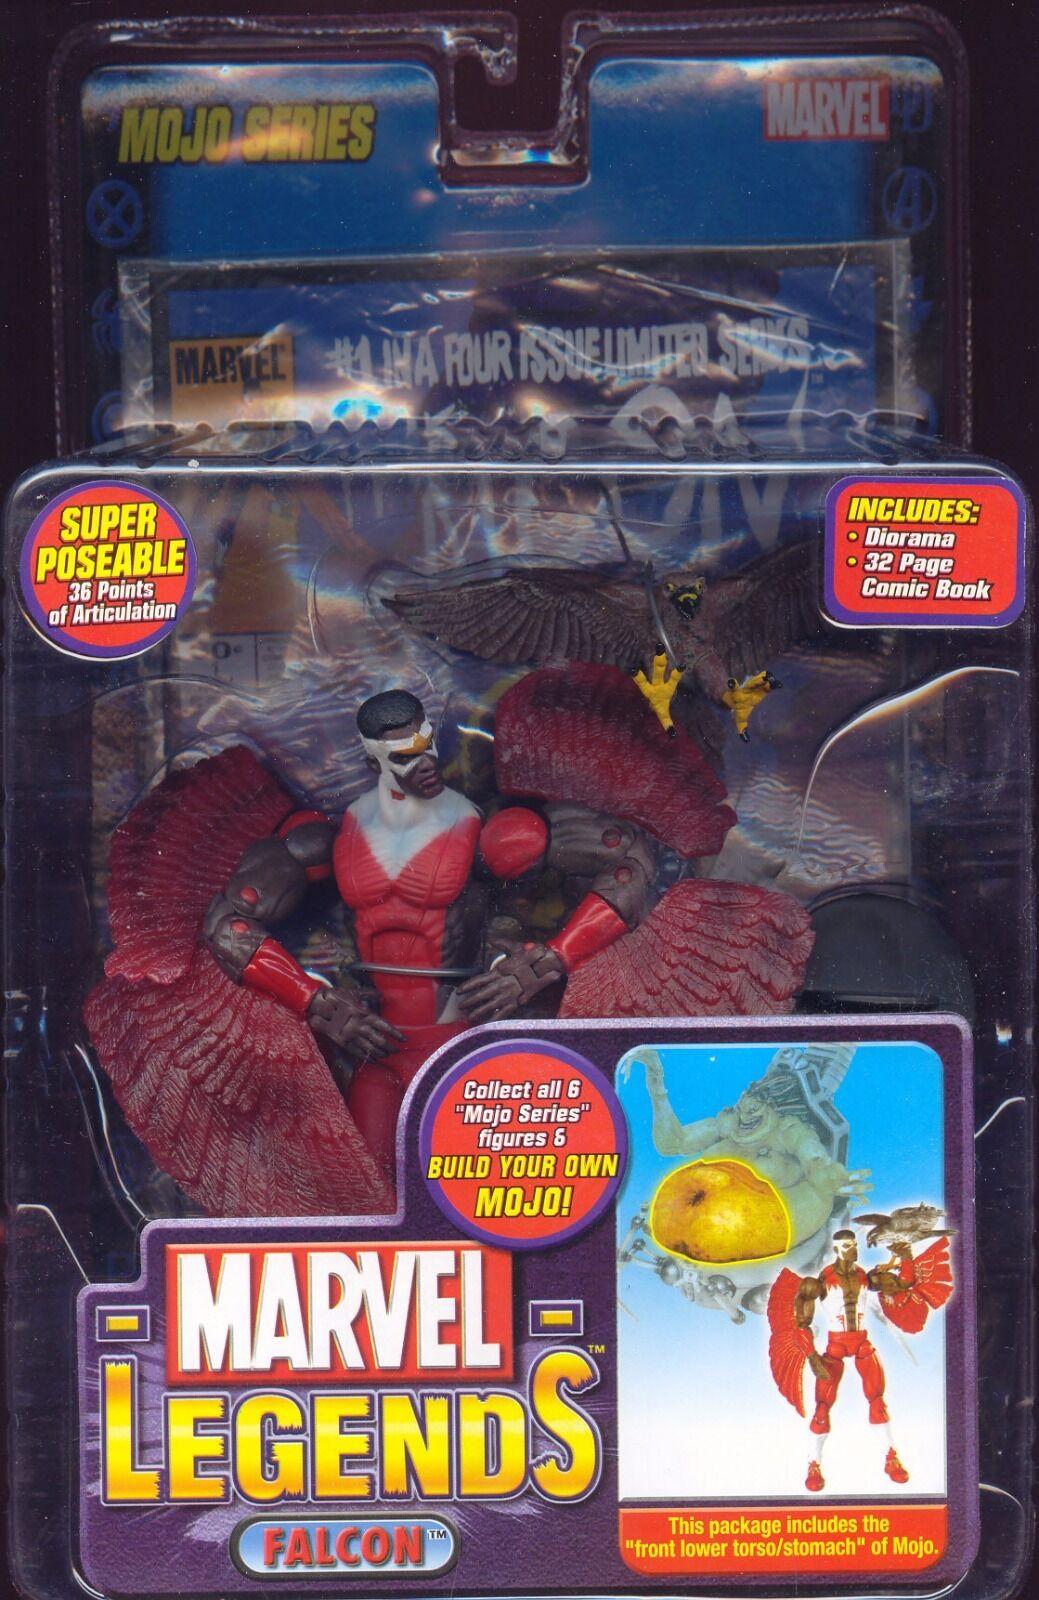 Marvel Legends Mojo BAF Series Falcon Variant (2006)